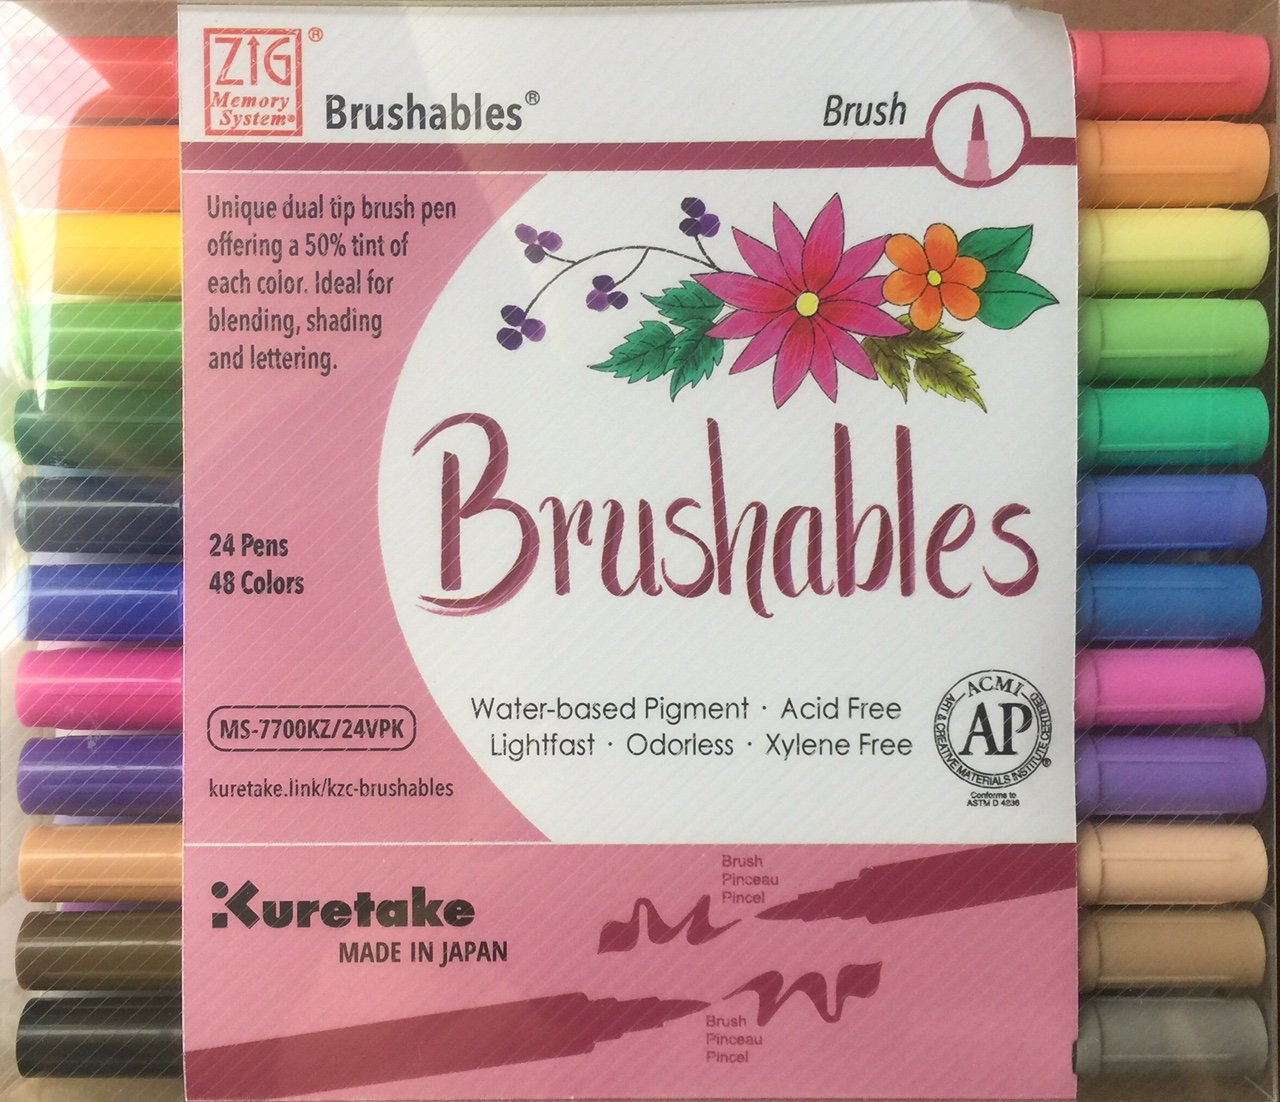 Kuretake Zig 24 Pack Brushables Dual Tip Brush Pens Color Marker by Zig